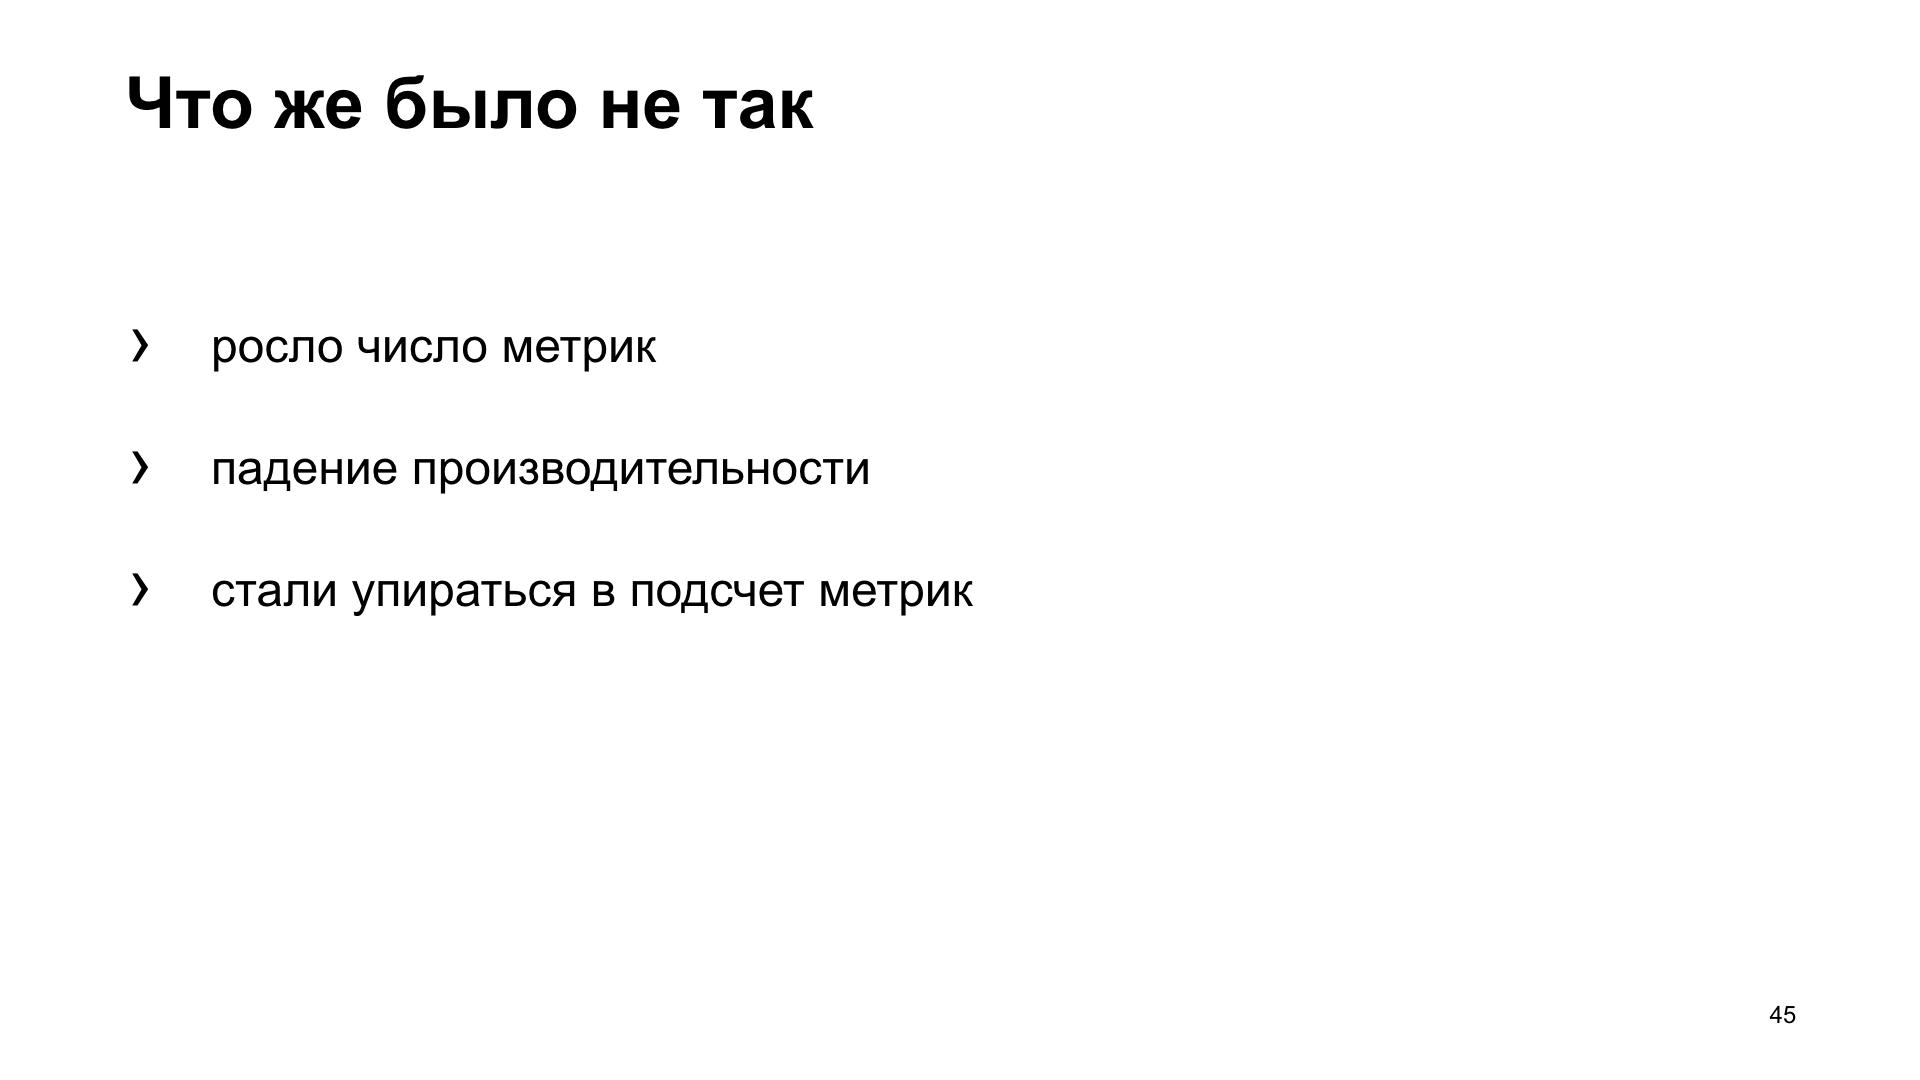 uWSGI в помощь метрикам. Доклад Яндекса - 35